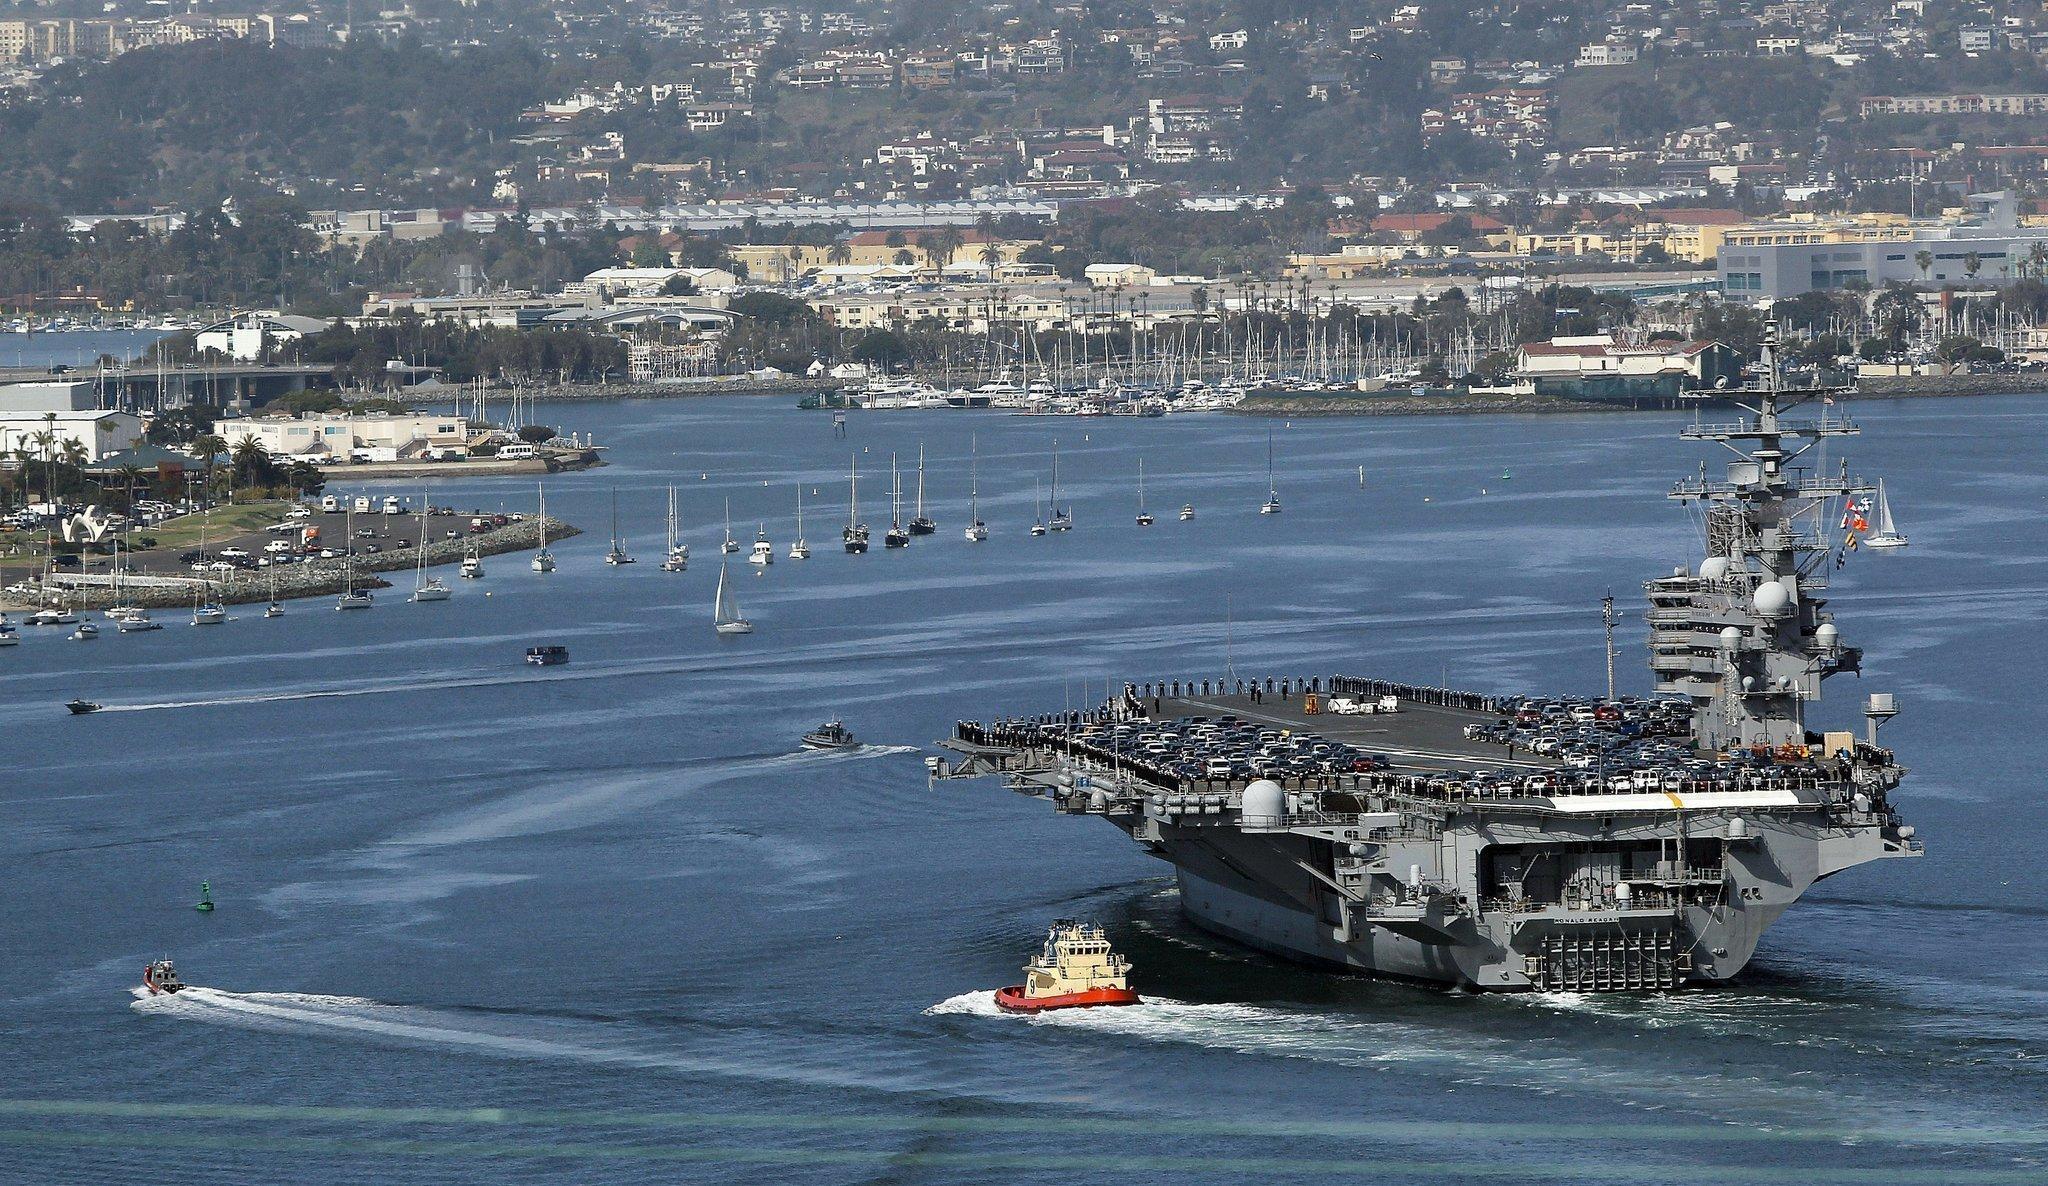 Uss Gerald R Ford Inside The World S Most Advanced Aircraft Carrier Fox News